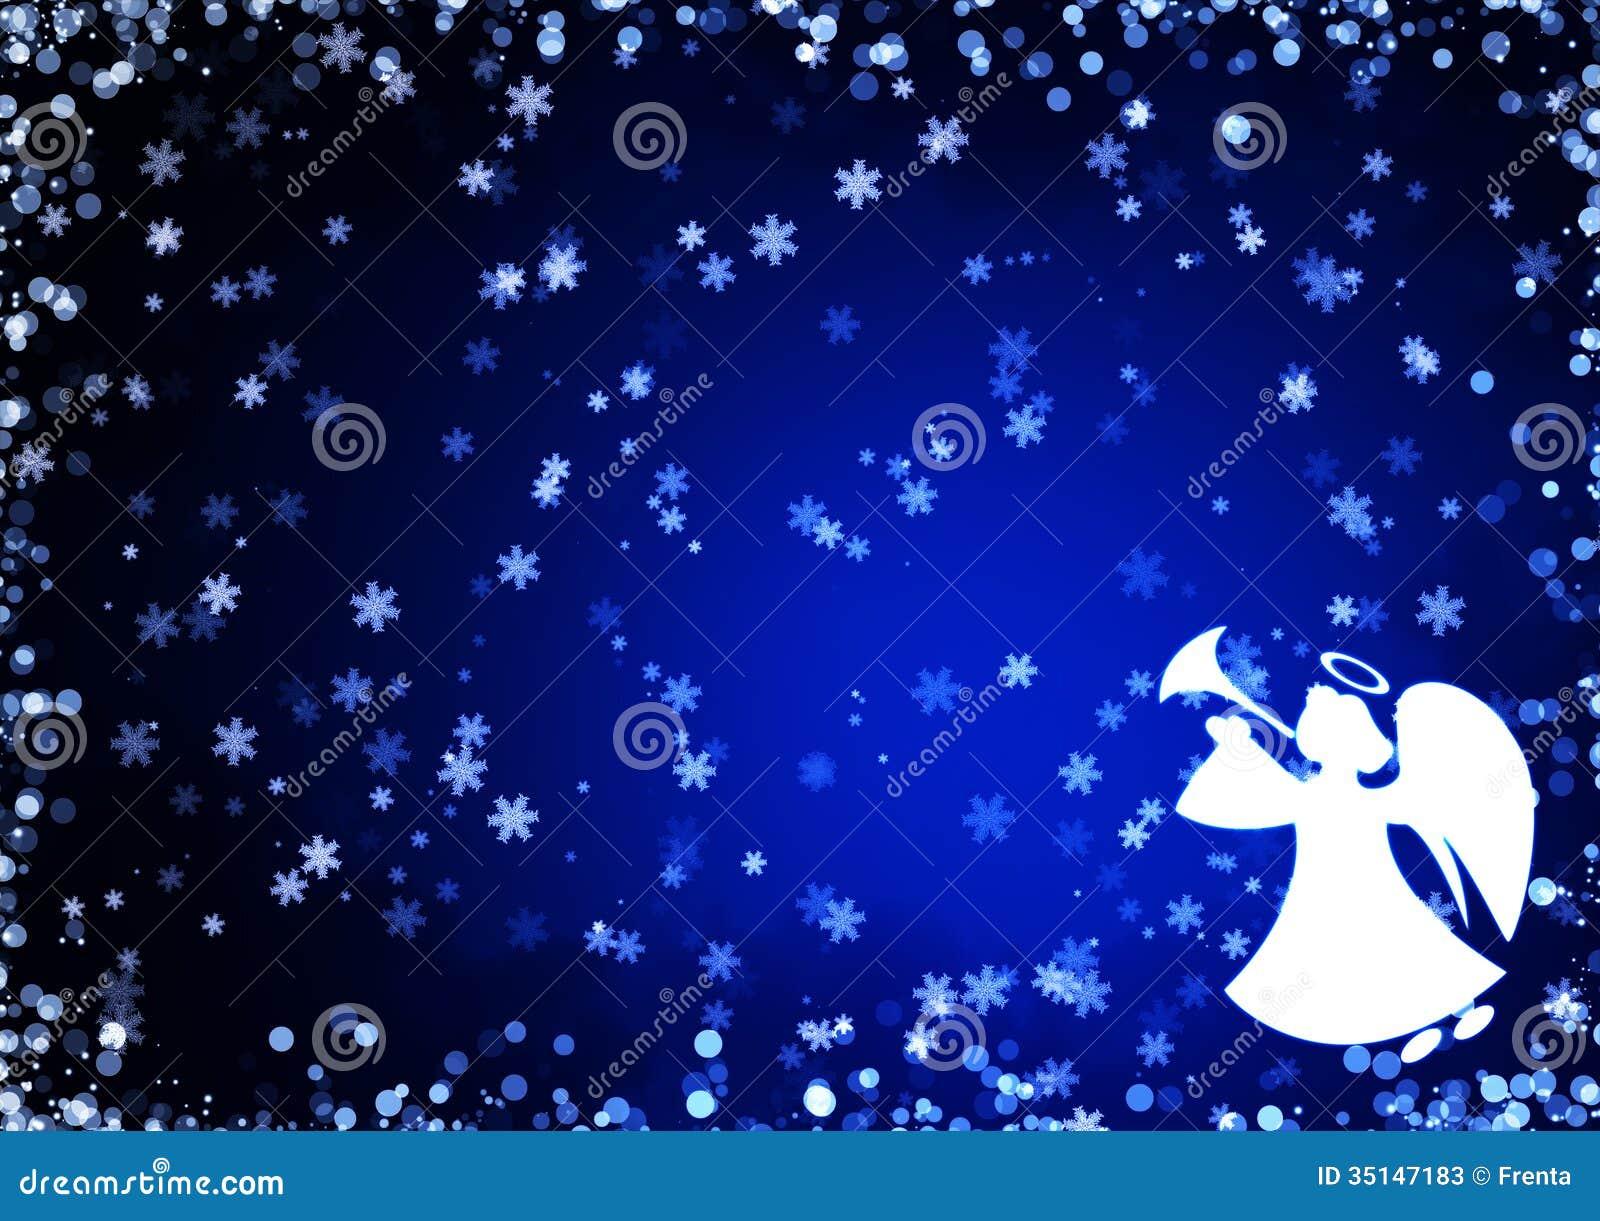 Christmas Background Stock Photos - Image: 35147183